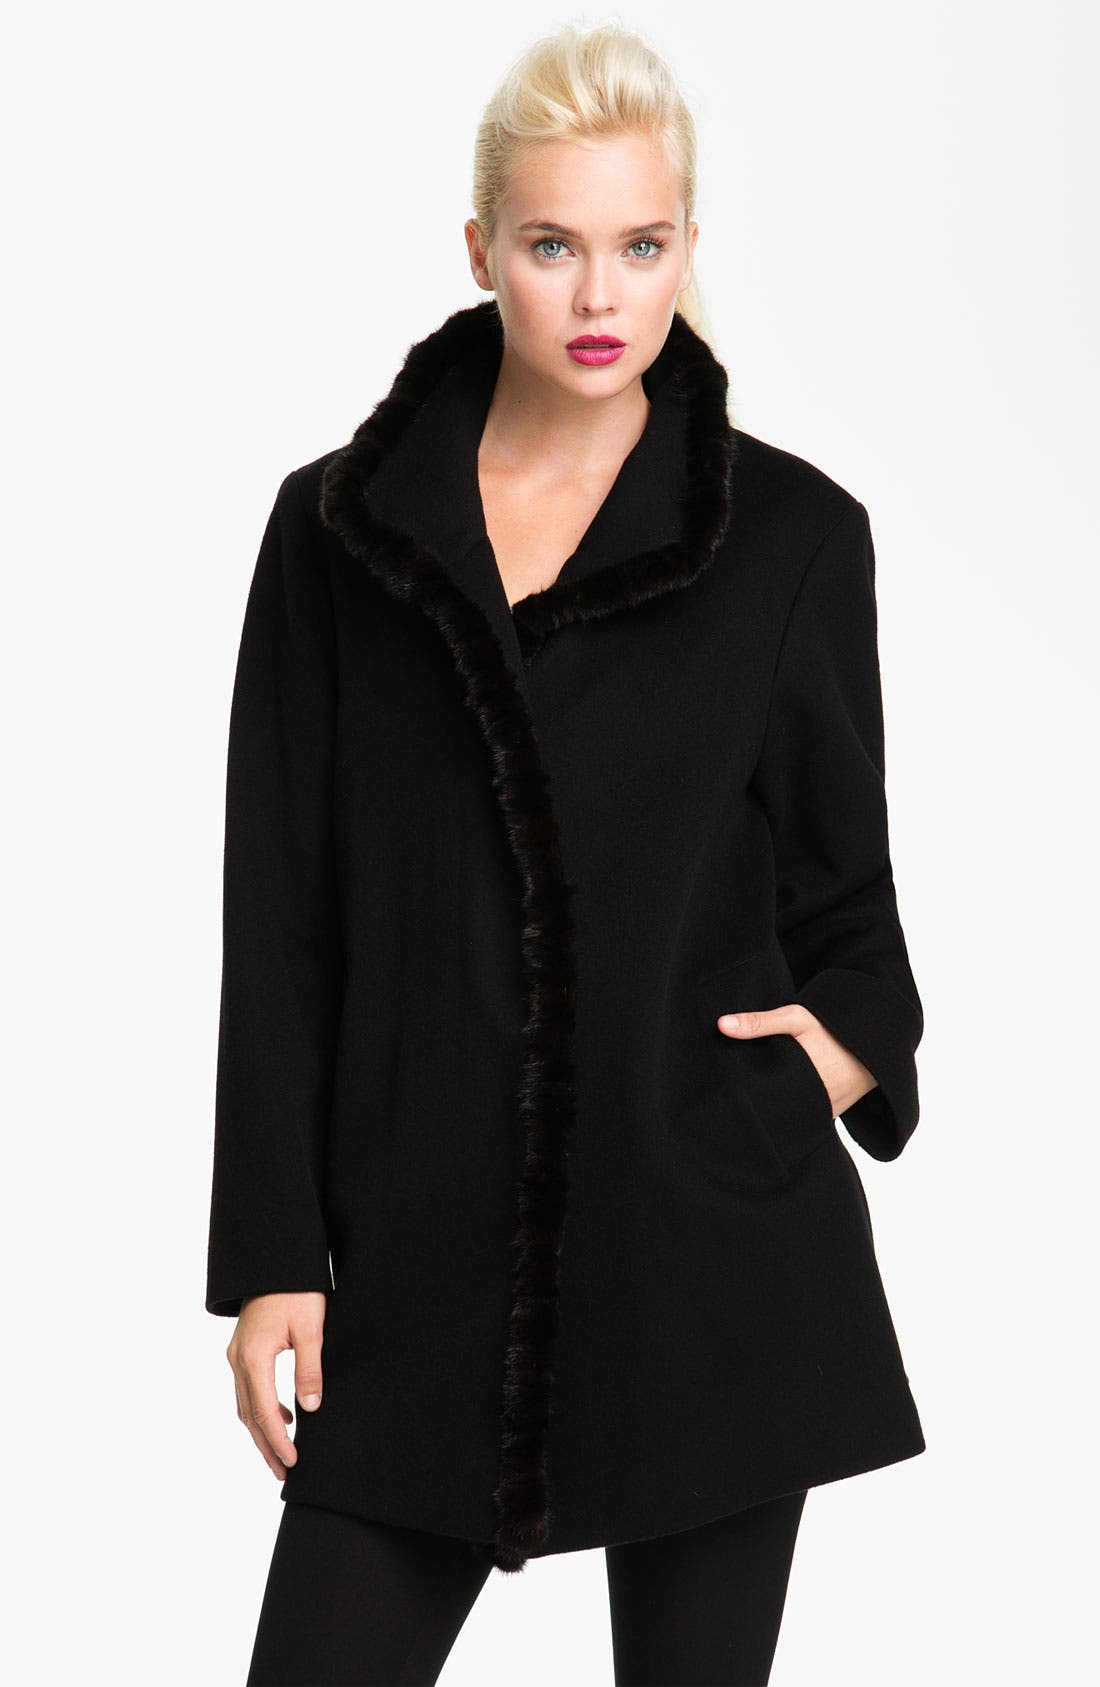 Alternate Image 1 Selected - Fleurette Genuine Mink Fur Trim Walking Coat (Petite)